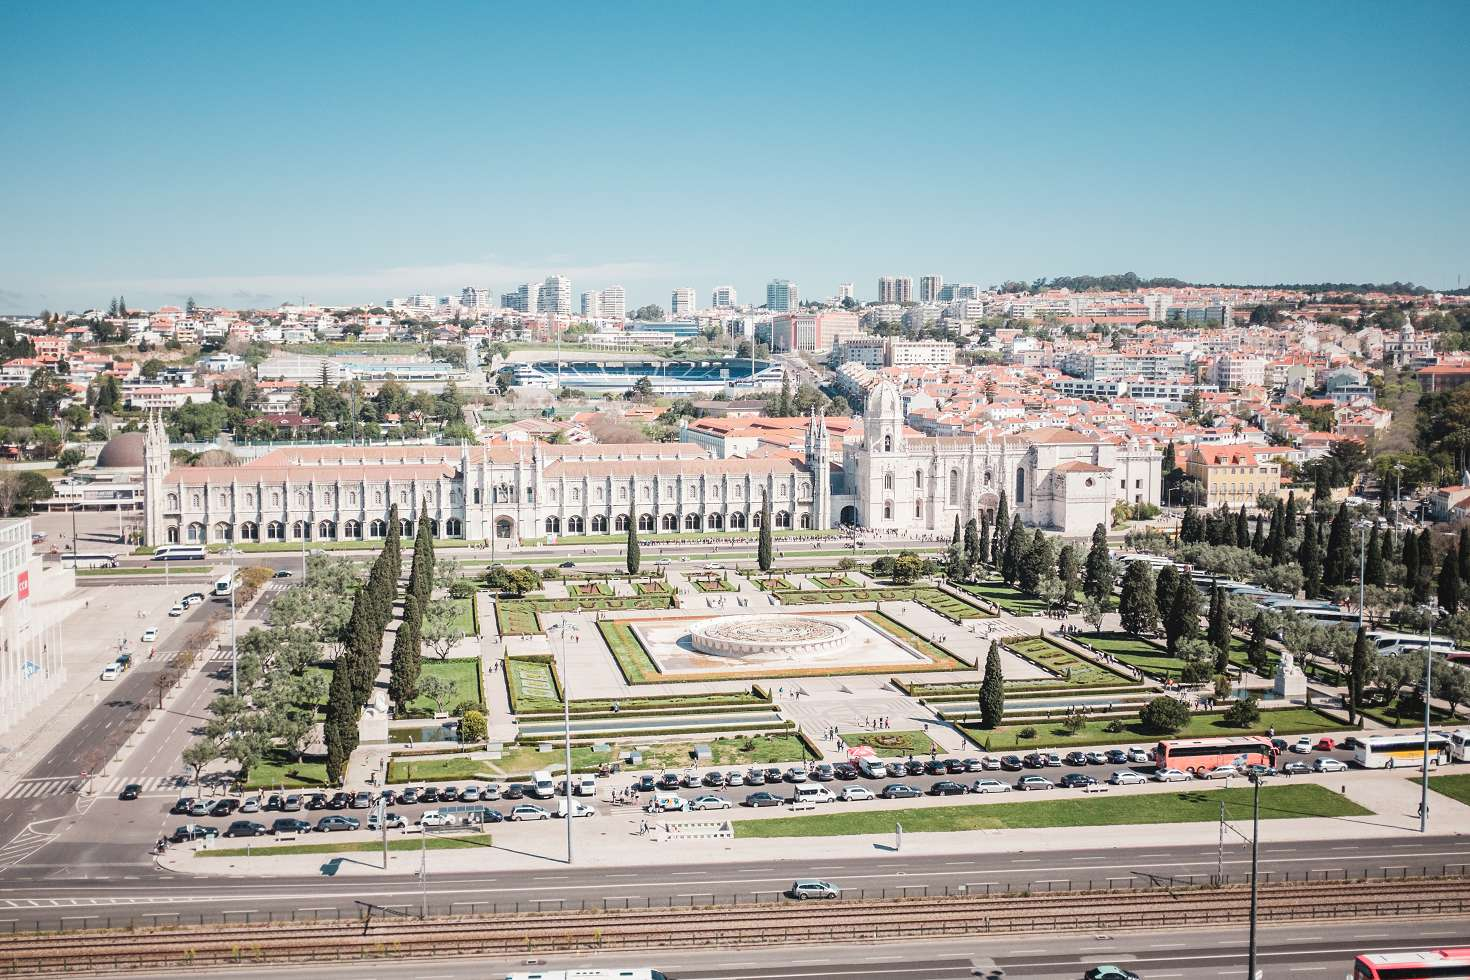 Valencia-Lissabon-Vigo-Stonehenge (23)